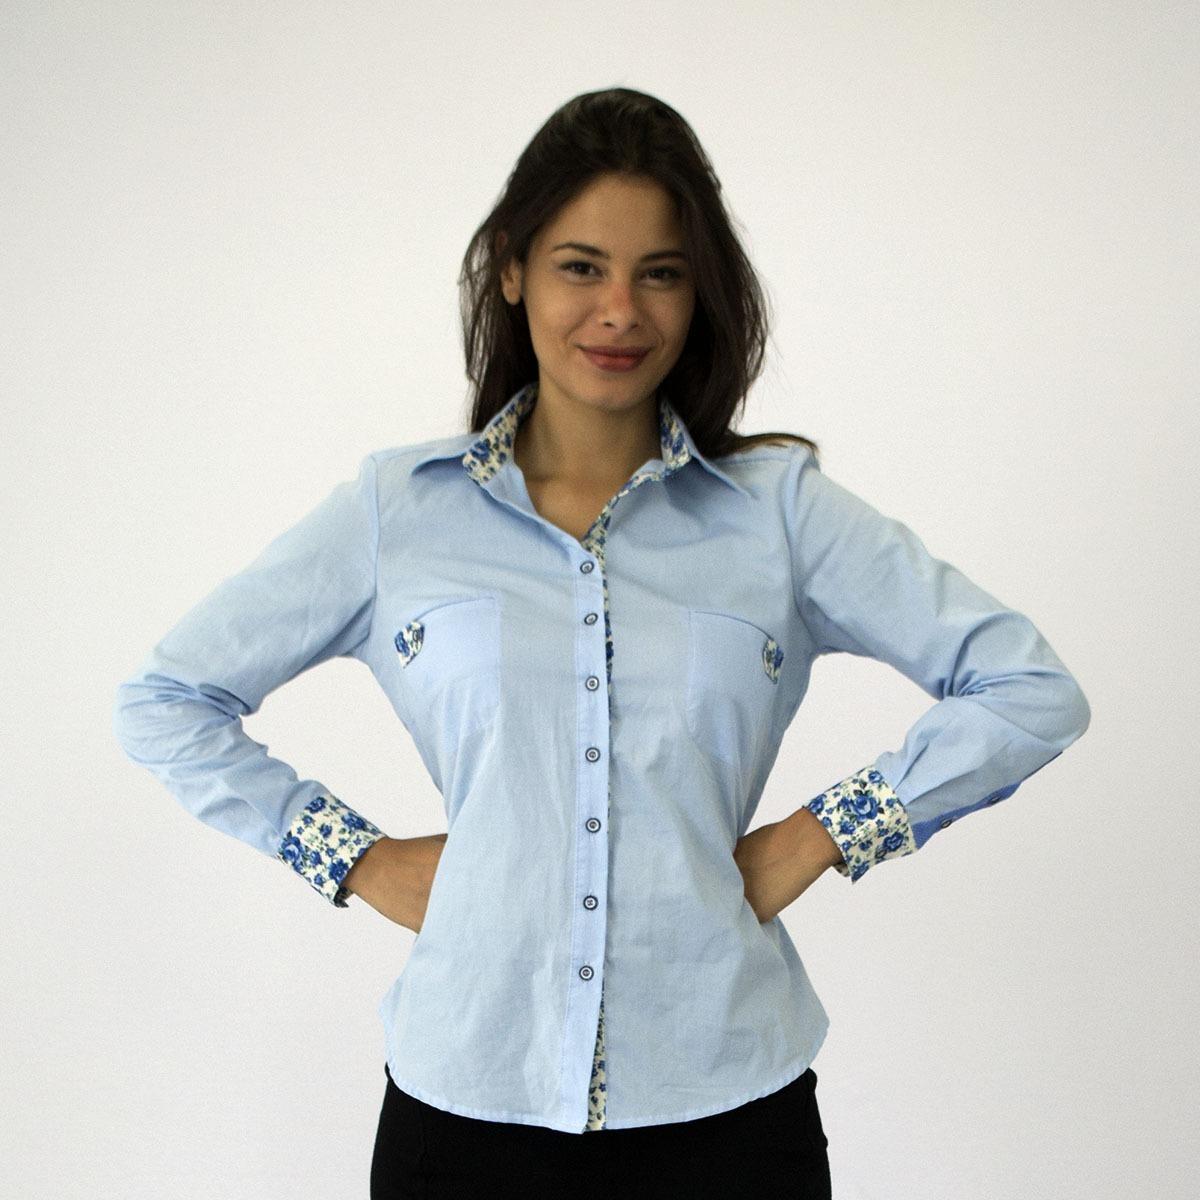 c3d031dba6 camisa social feminina azul claro com bolsos manga longa. Carregando zoom.